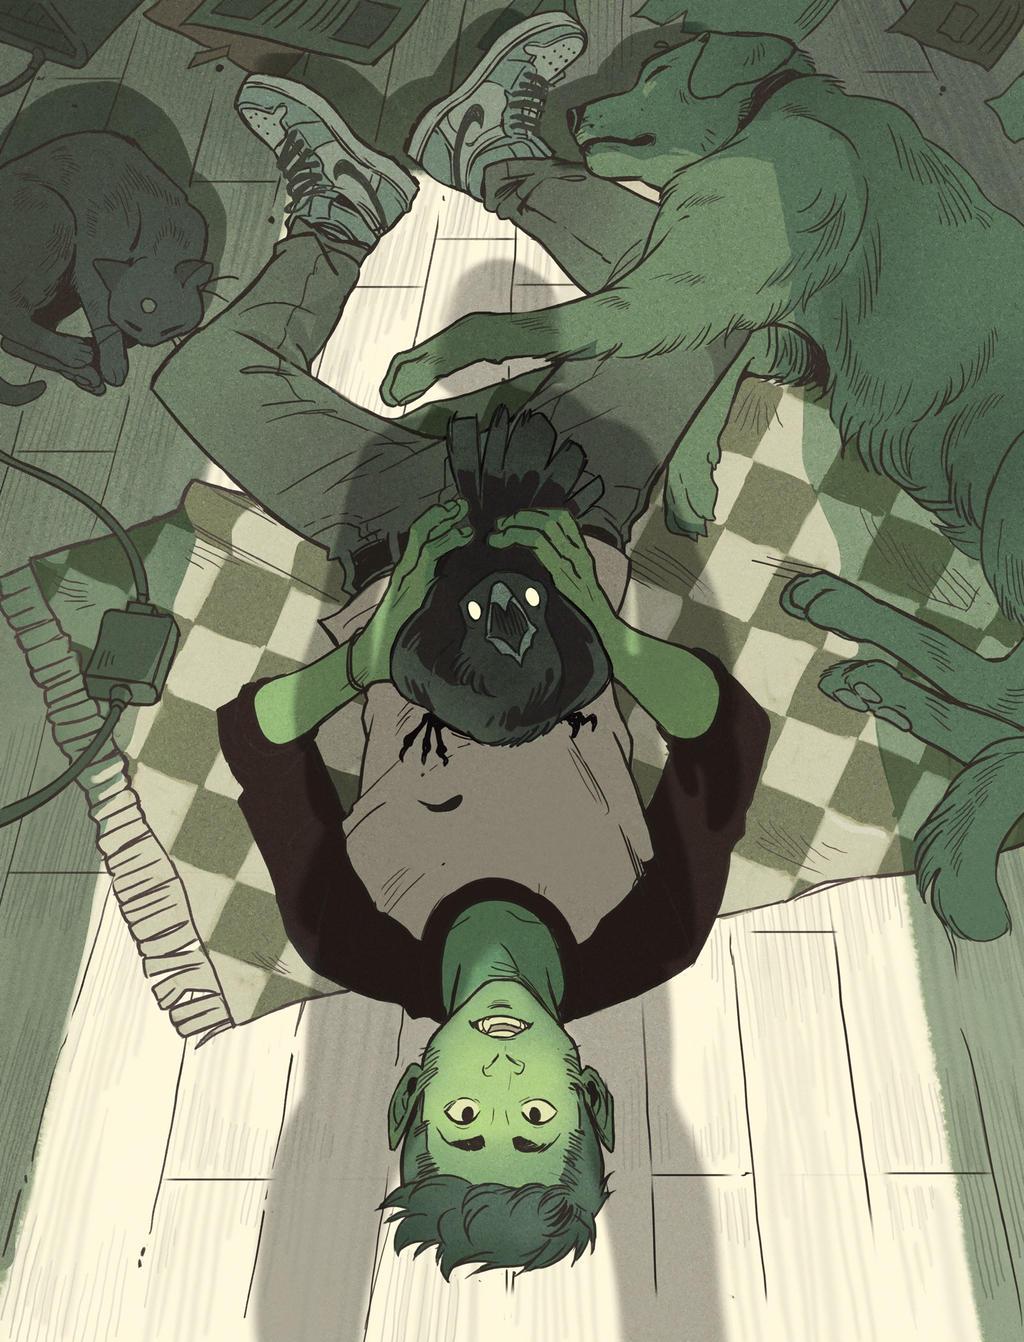 When did we adopt a raven? by Picolo-kun